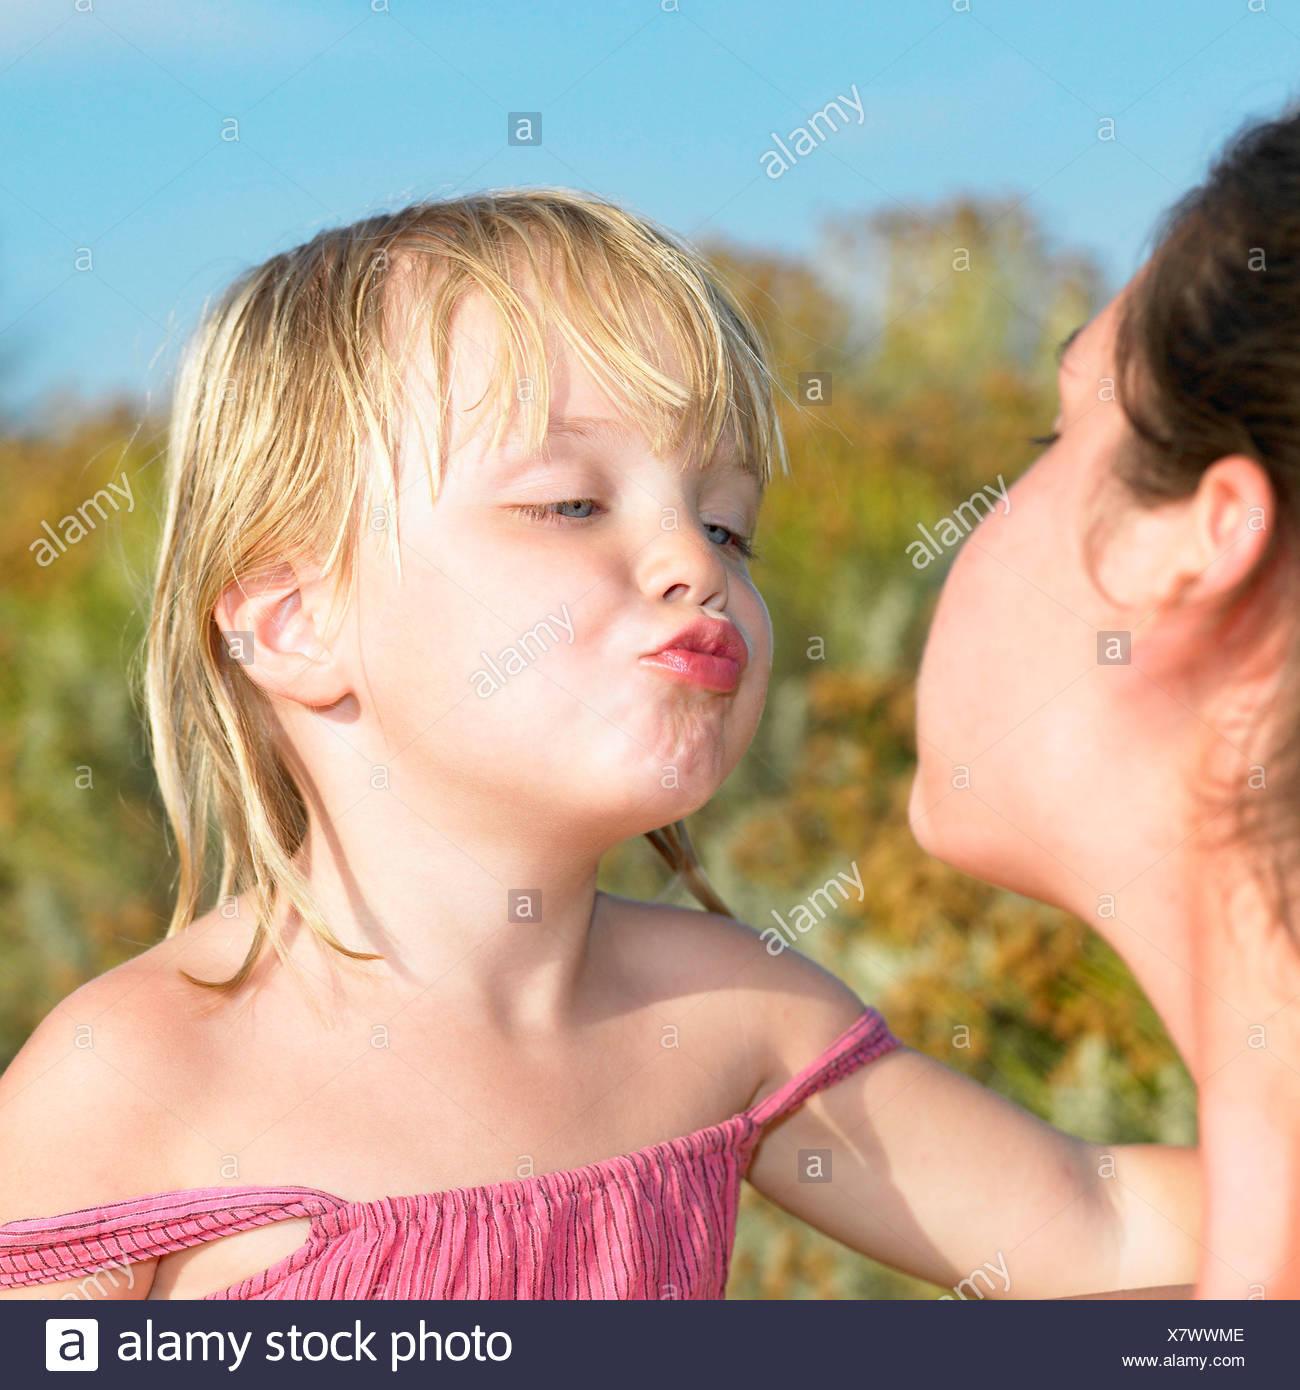 Fille sur sa façon de donner un baiser Photo Stock